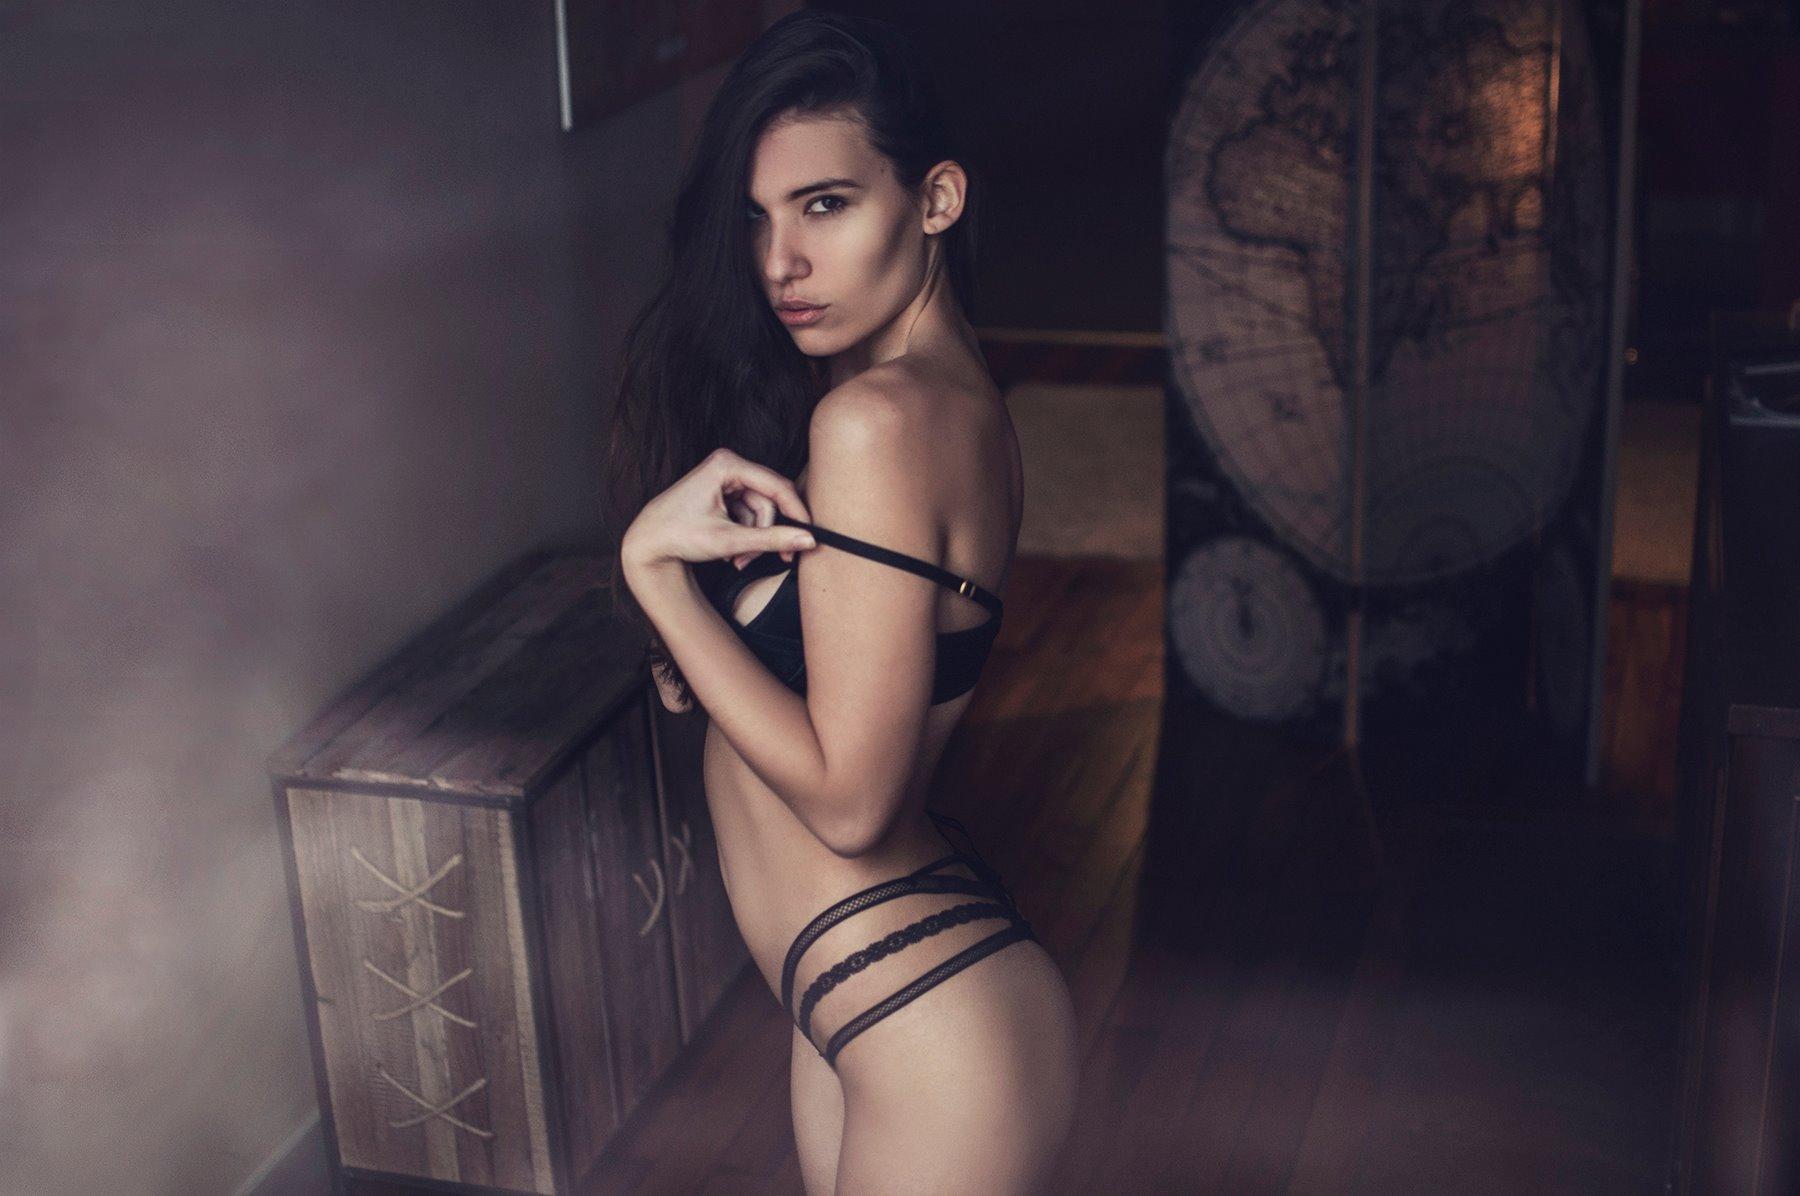 Hot Matilde Simone nude (84 photos), Pussy, Bikini, Feet, see through 2006